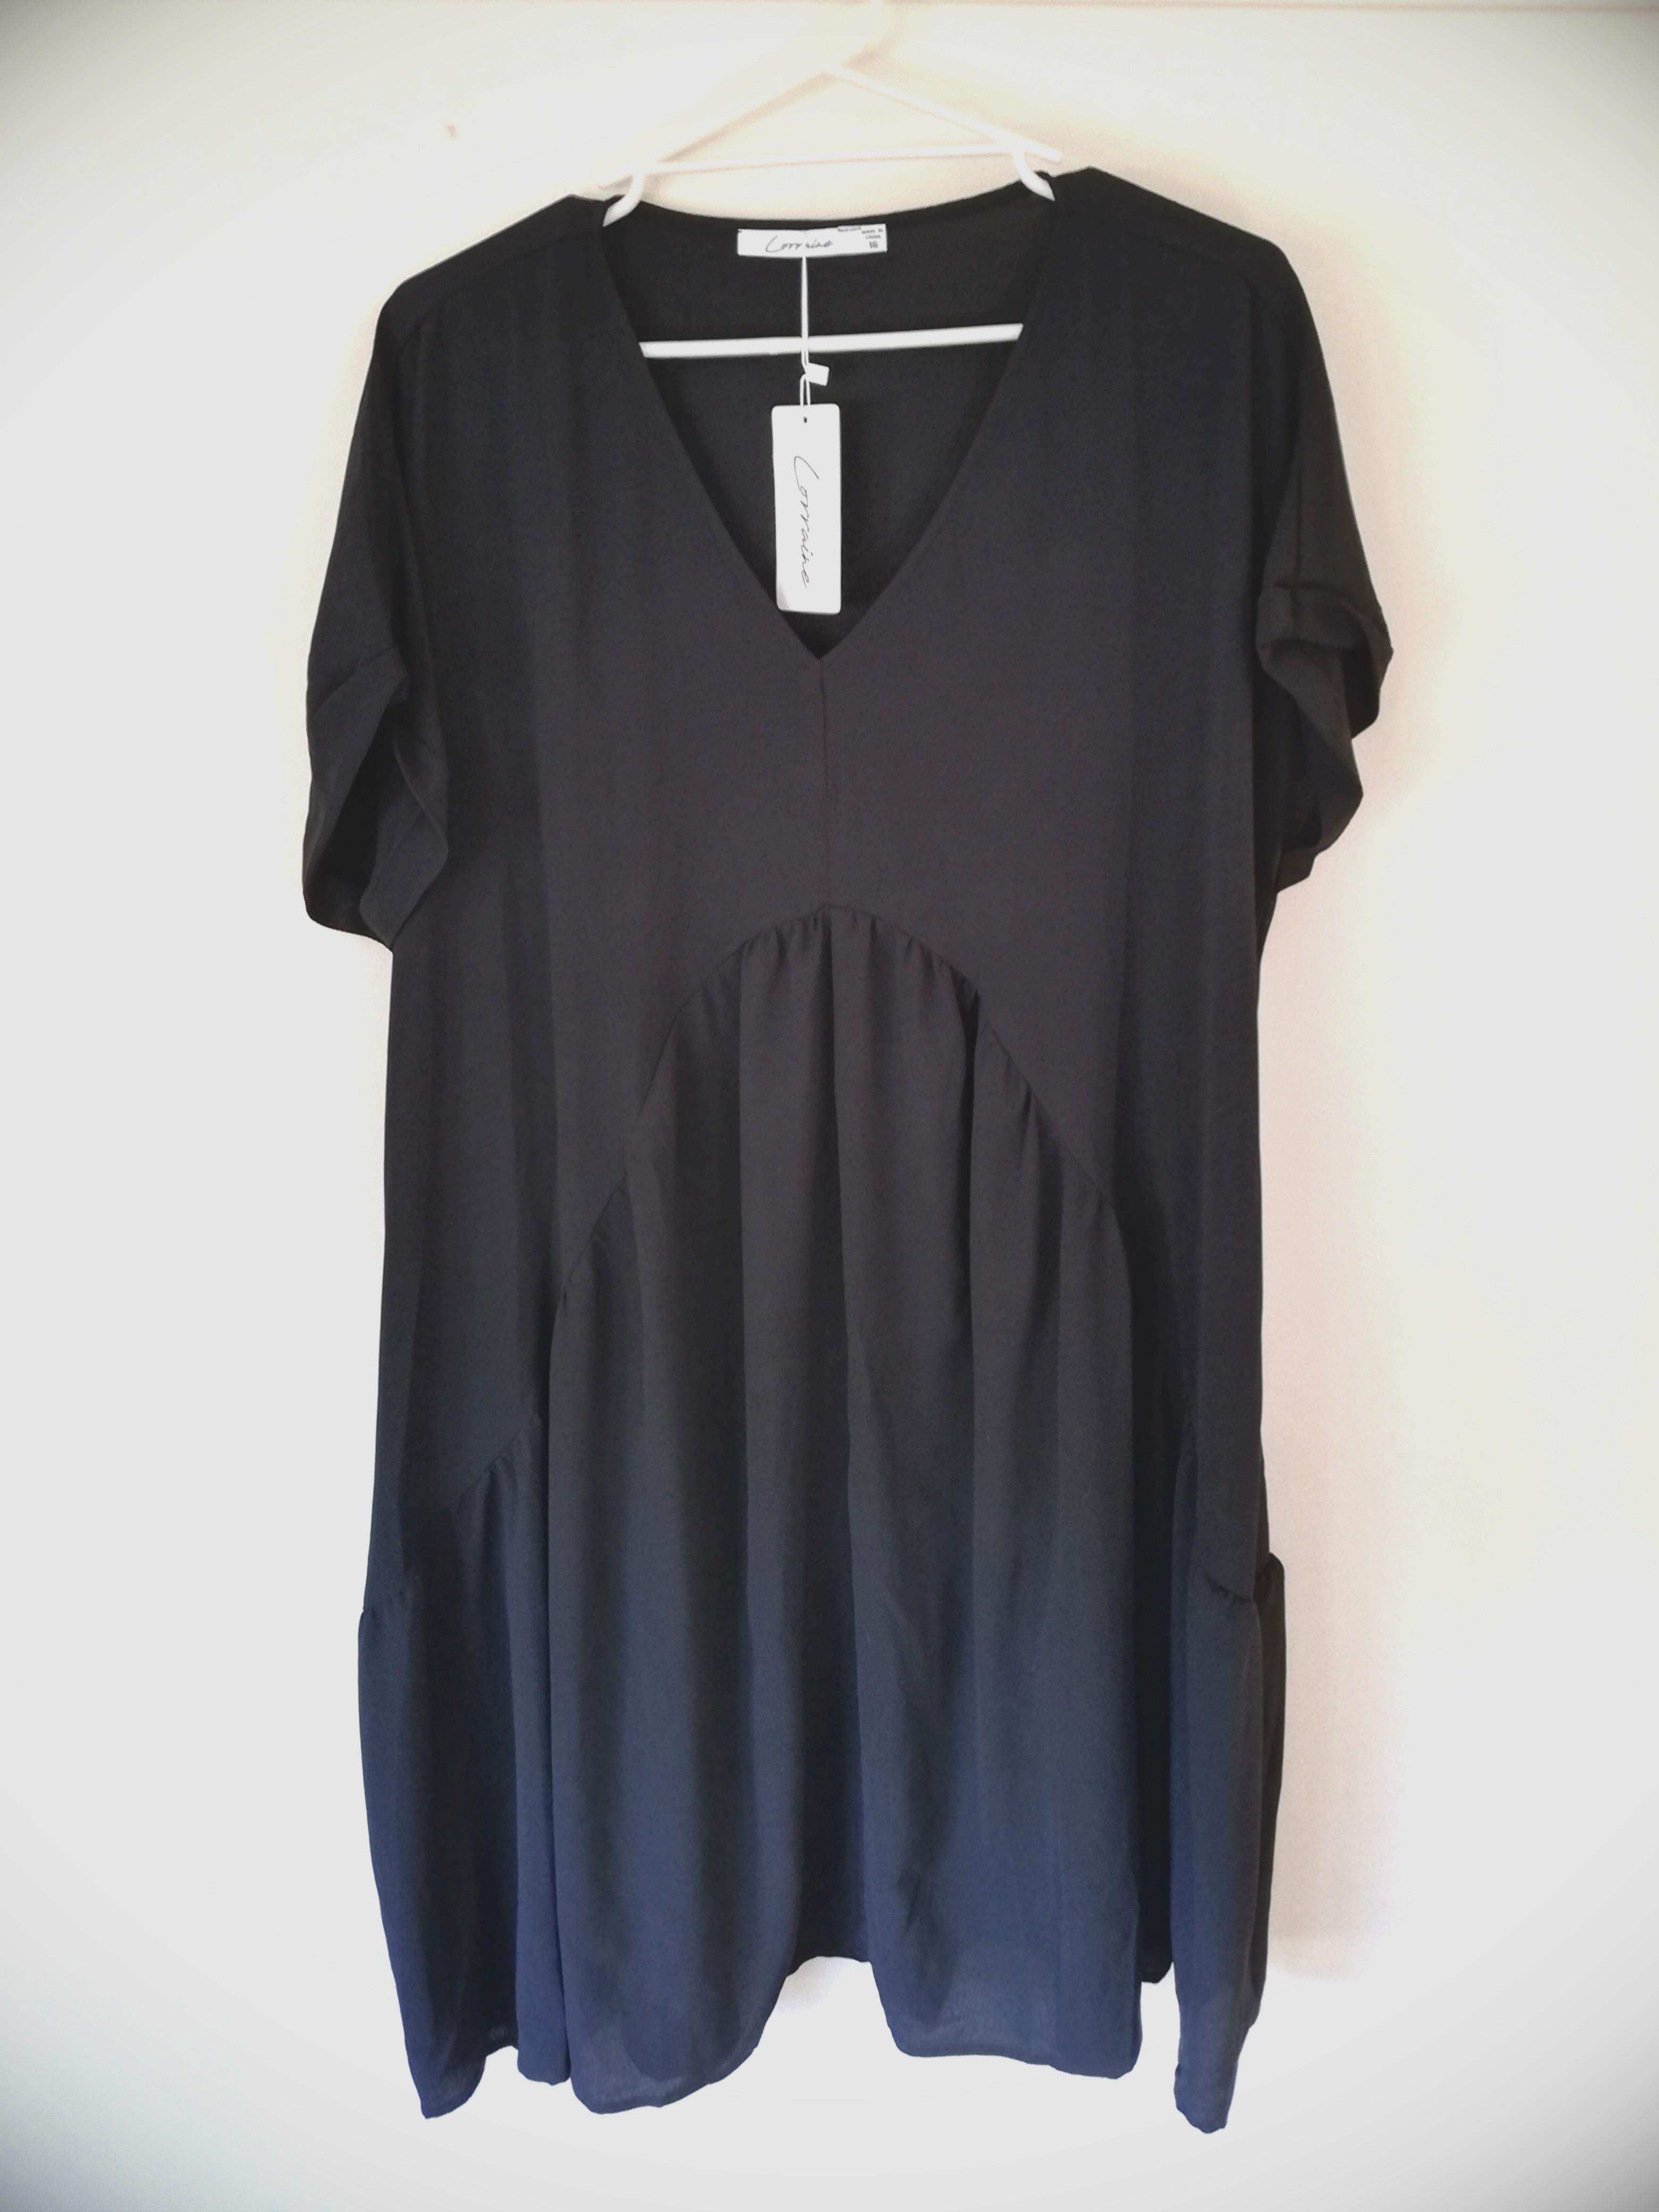 ~Lorraine / size 16 / charlotte black formal dress / BNWT~